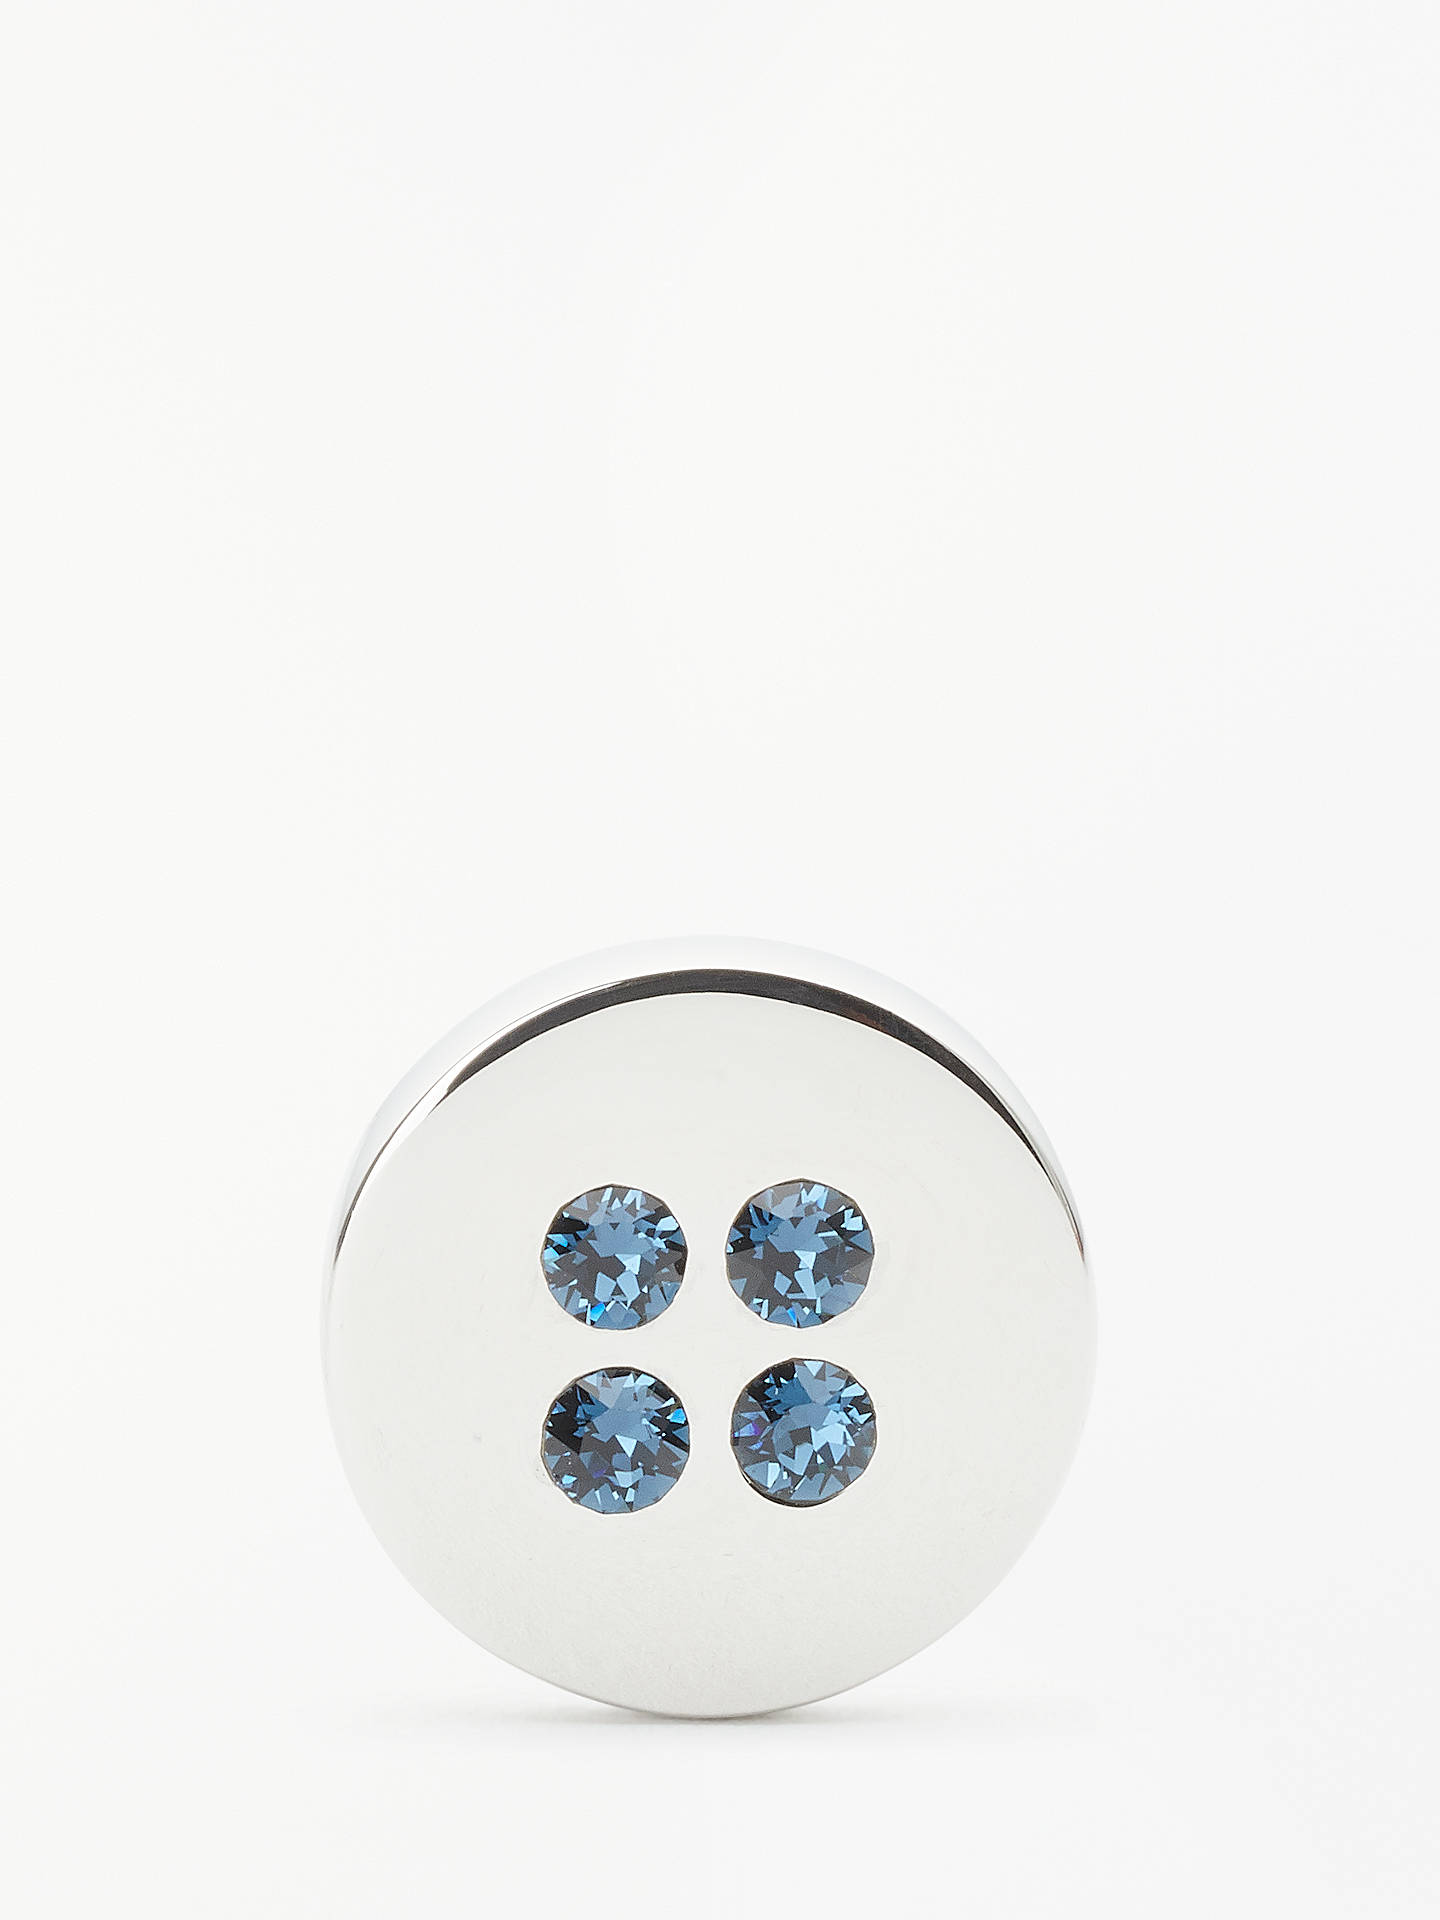 9e25ad28ccf0d Simon Carter Swarovski Crystal Button Cufflinks, Montana Blue